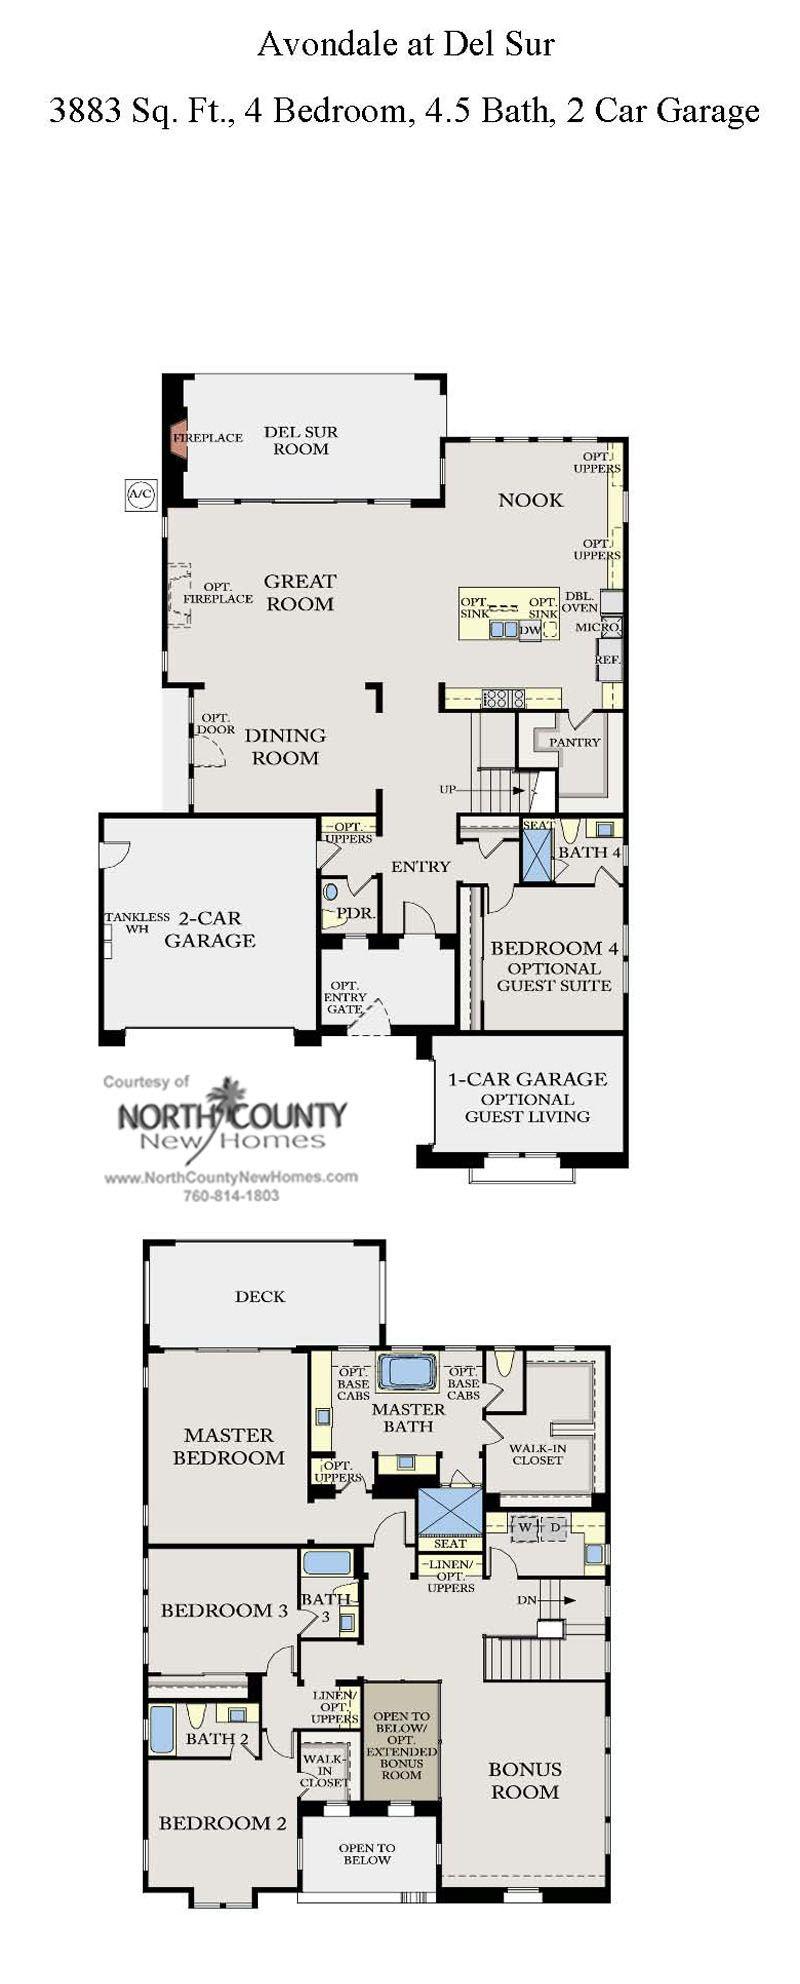 Avondale At Del Sur Floor Plans New Homes In Del Sur Floor Plans How To Plan New Homes